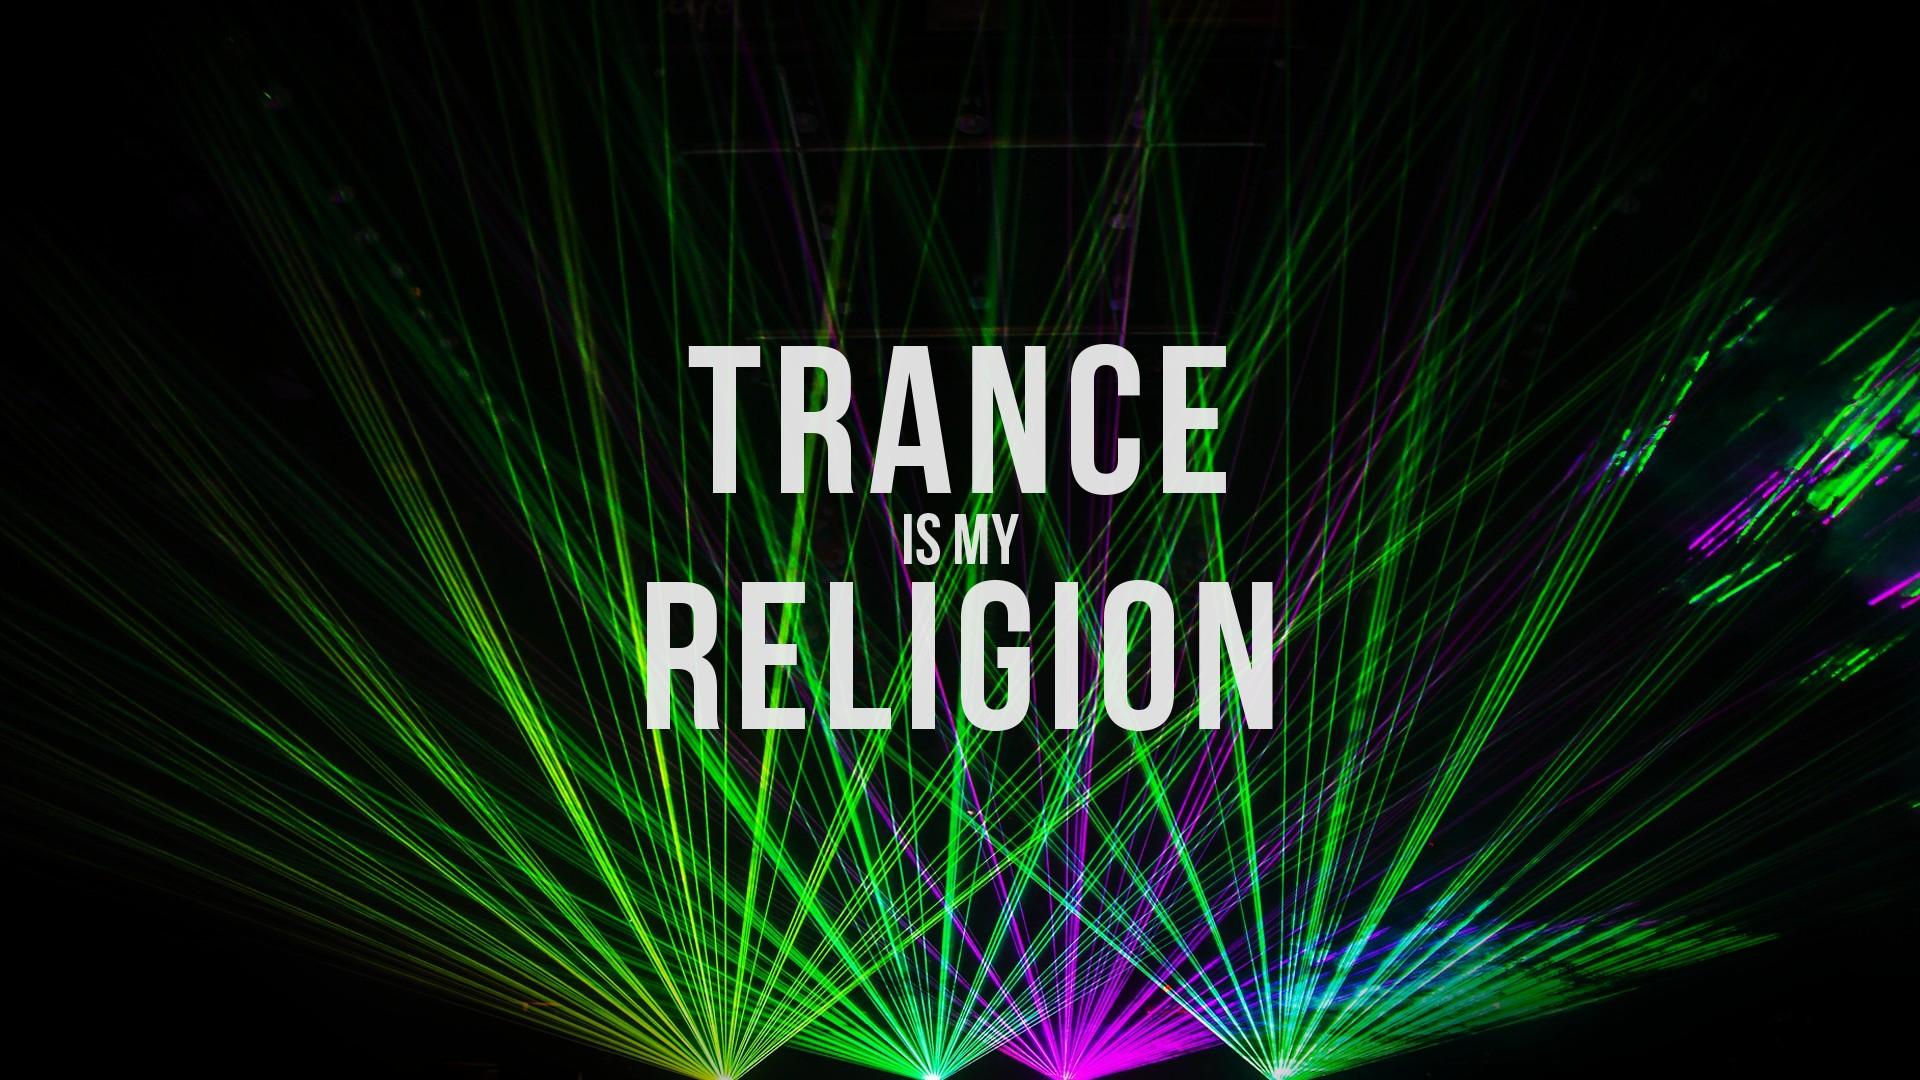 Fantastic Wallpaper Music Bright - 1920x1080-px-bright-music-rave-religion-trance-1211628  Snapshot_48983.jpg